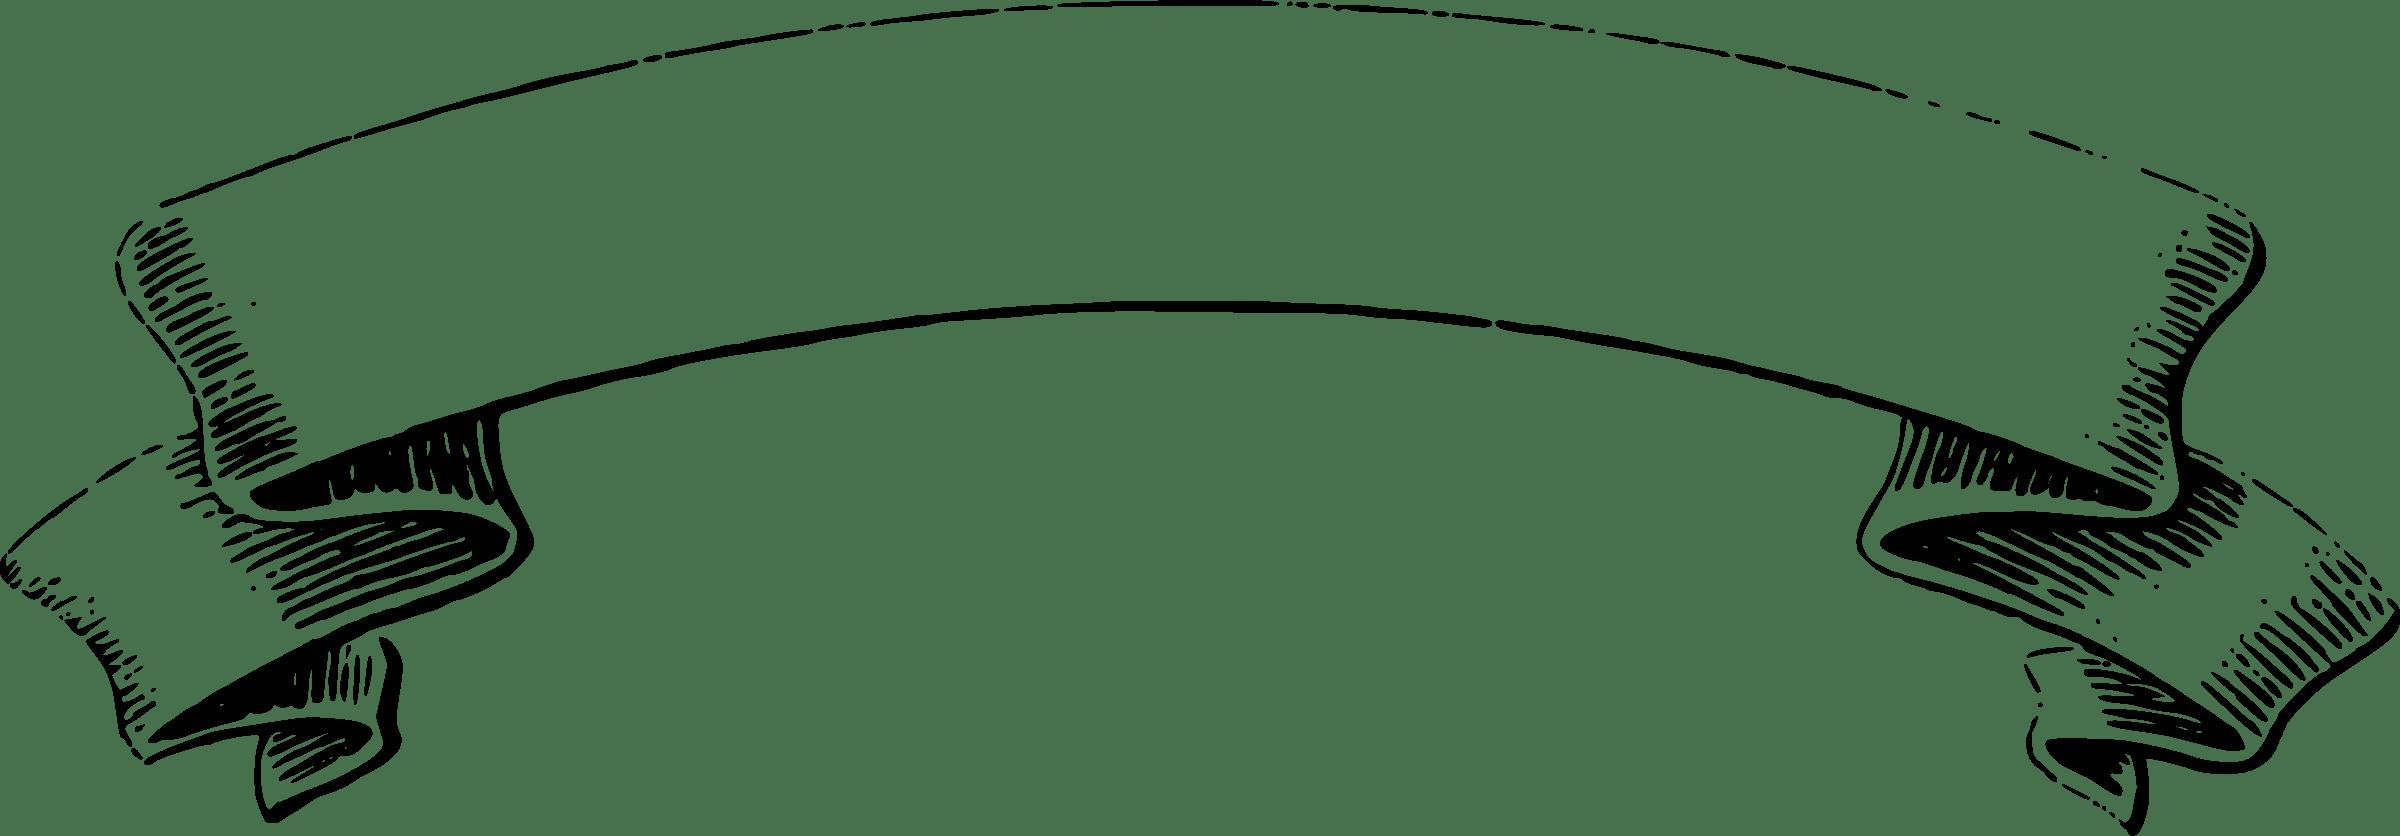 Free Transparent Ribbon Cliparts Download Free Clip Art